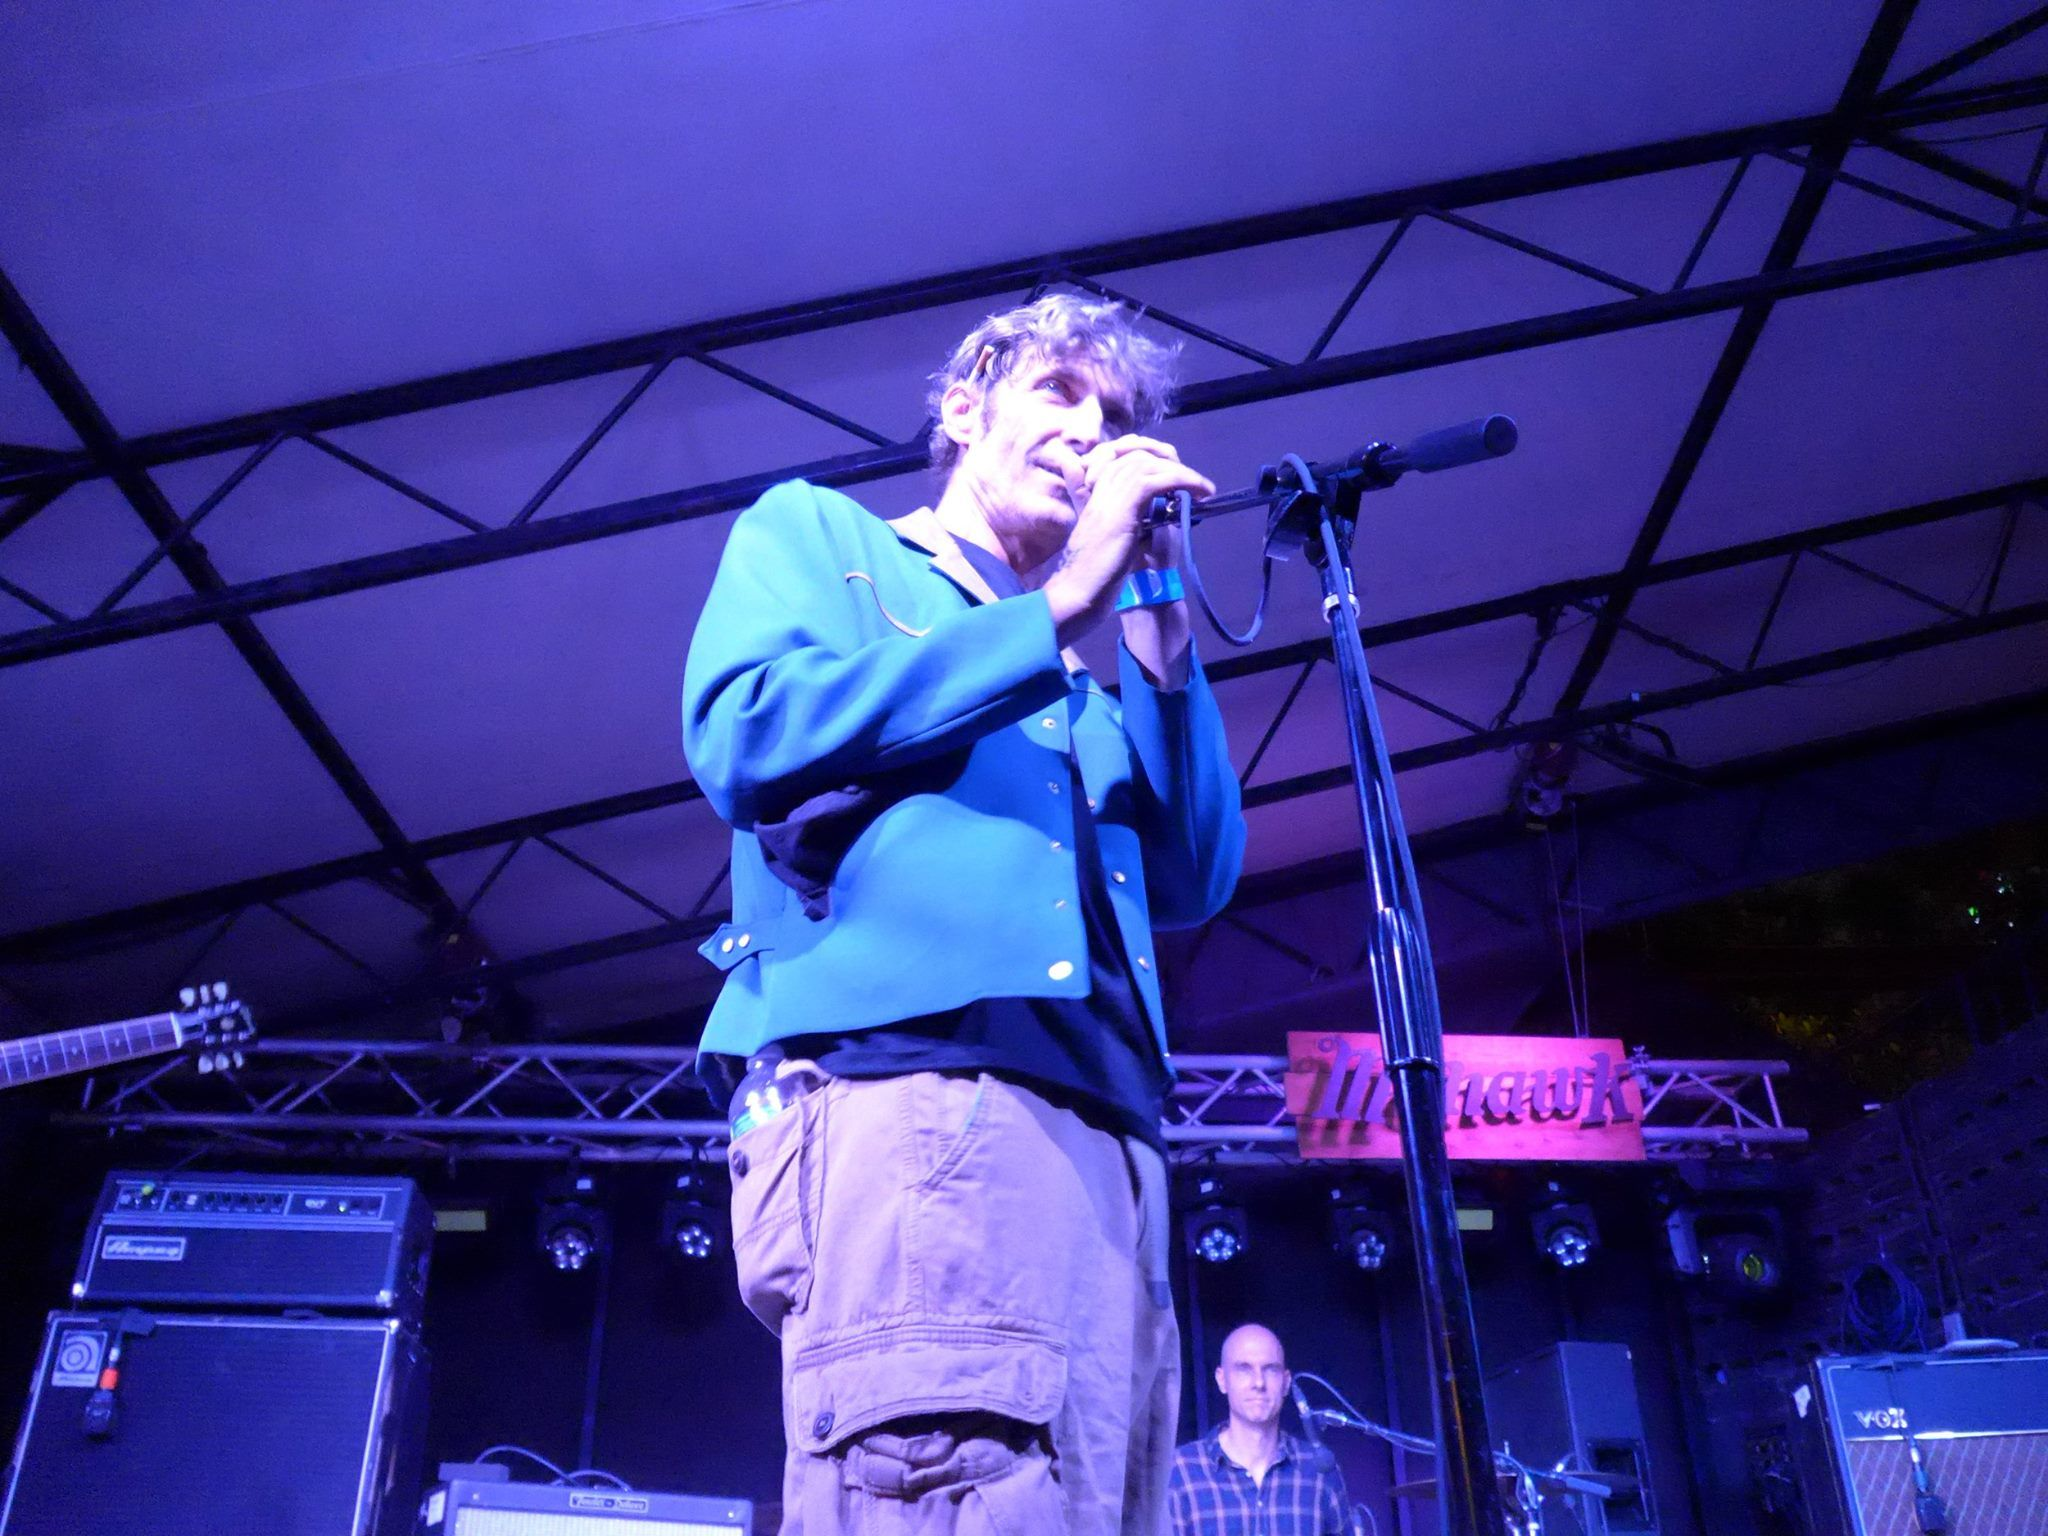 Terry Tolkin introducing Luna in Austin (Photo: Joakim)